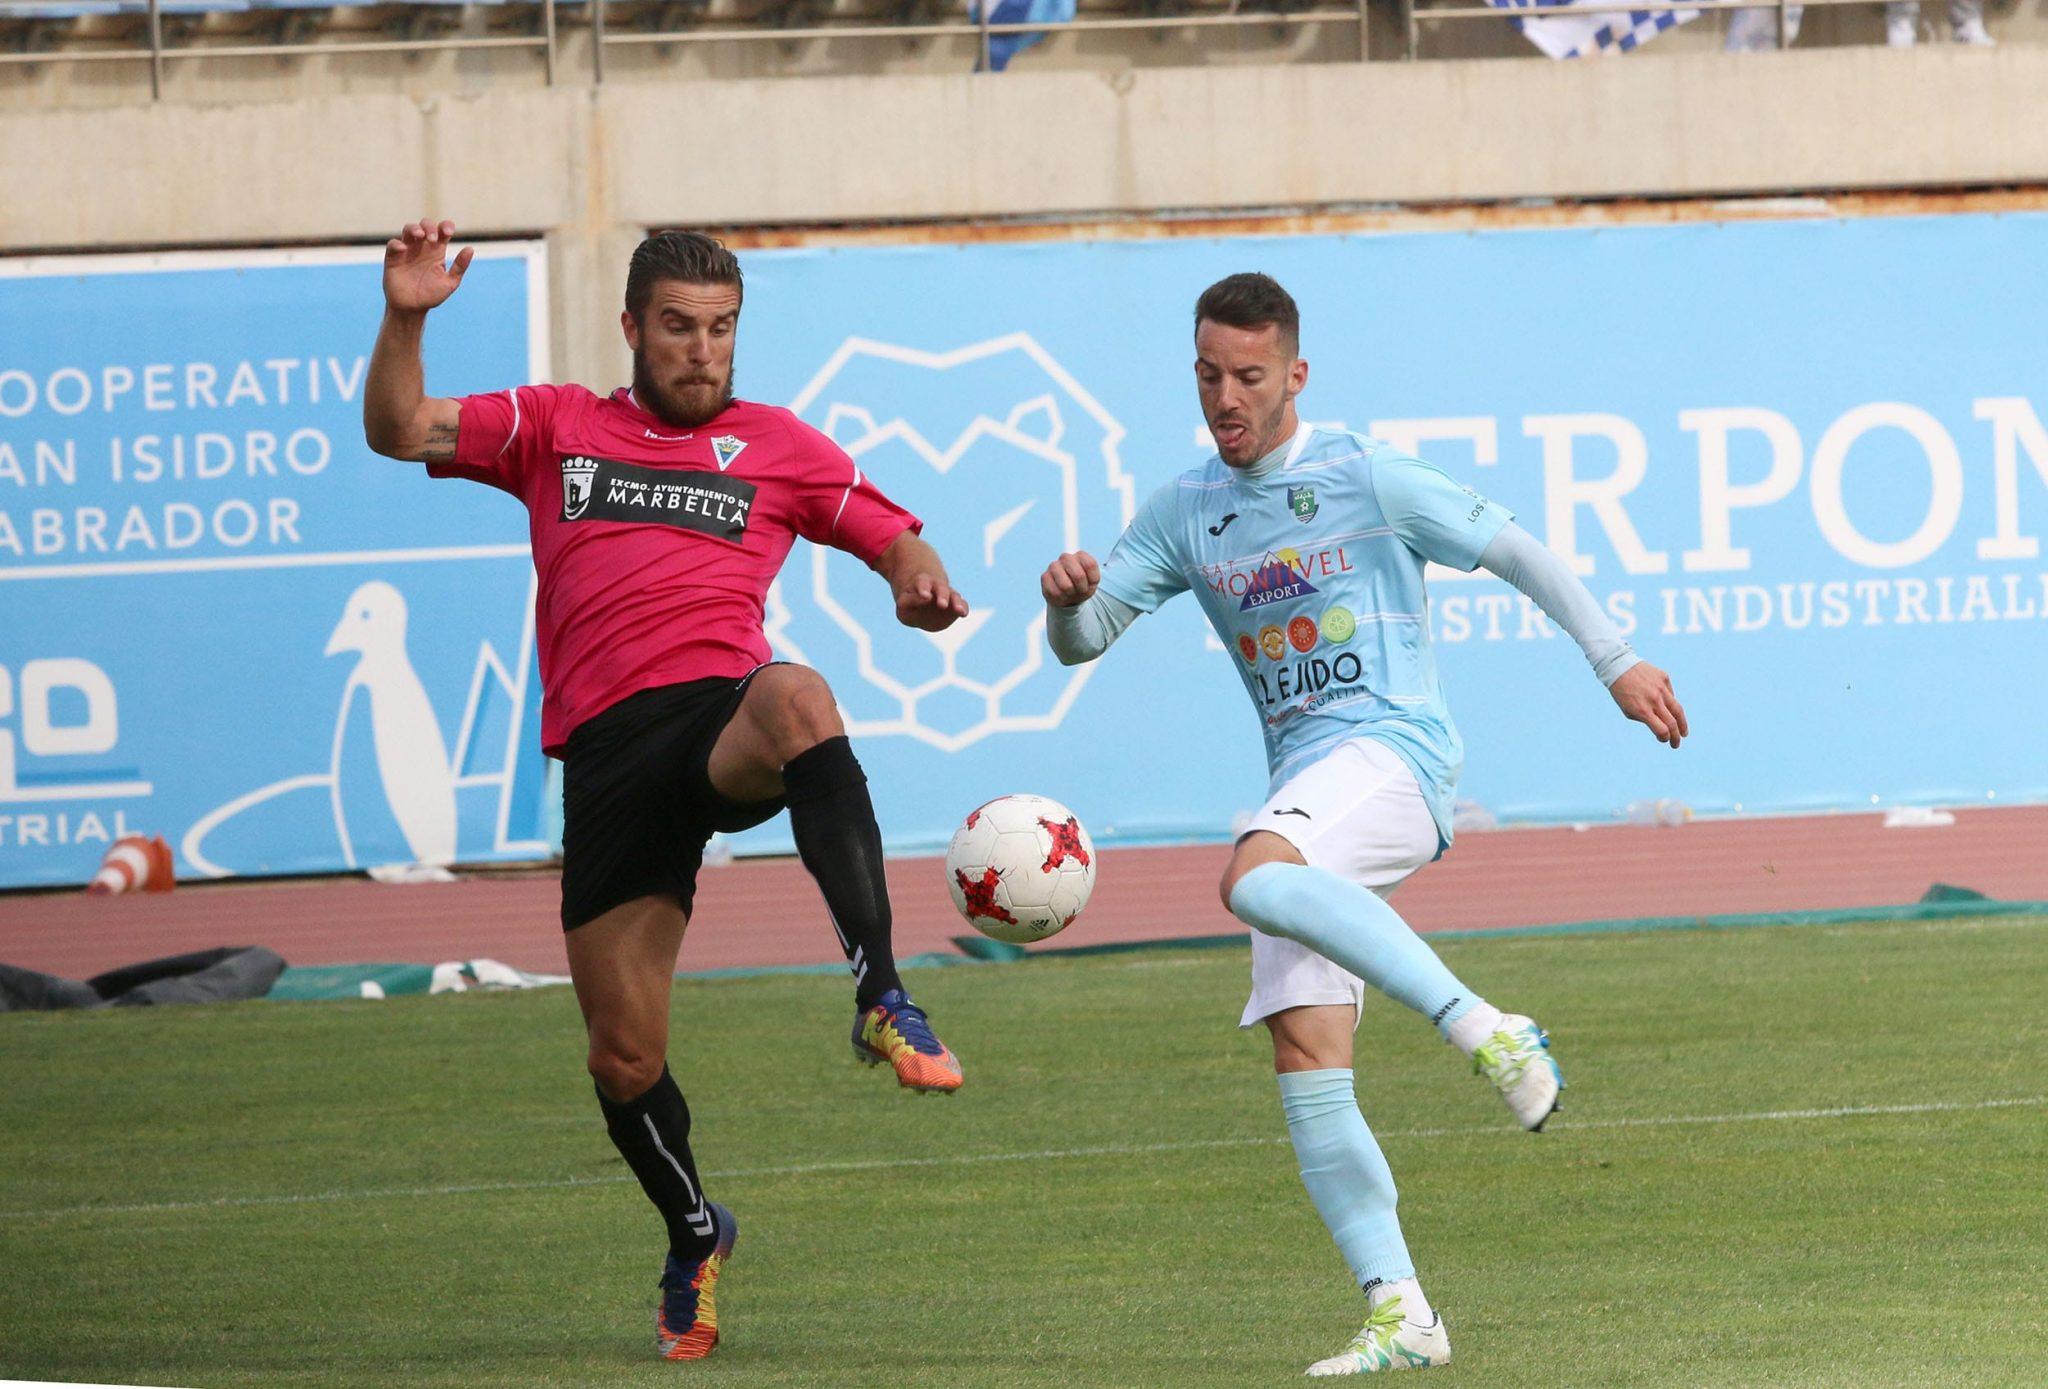 El Marbella FC se clasifica matemáticamente para jugar la fase de ascenso a Segunda A